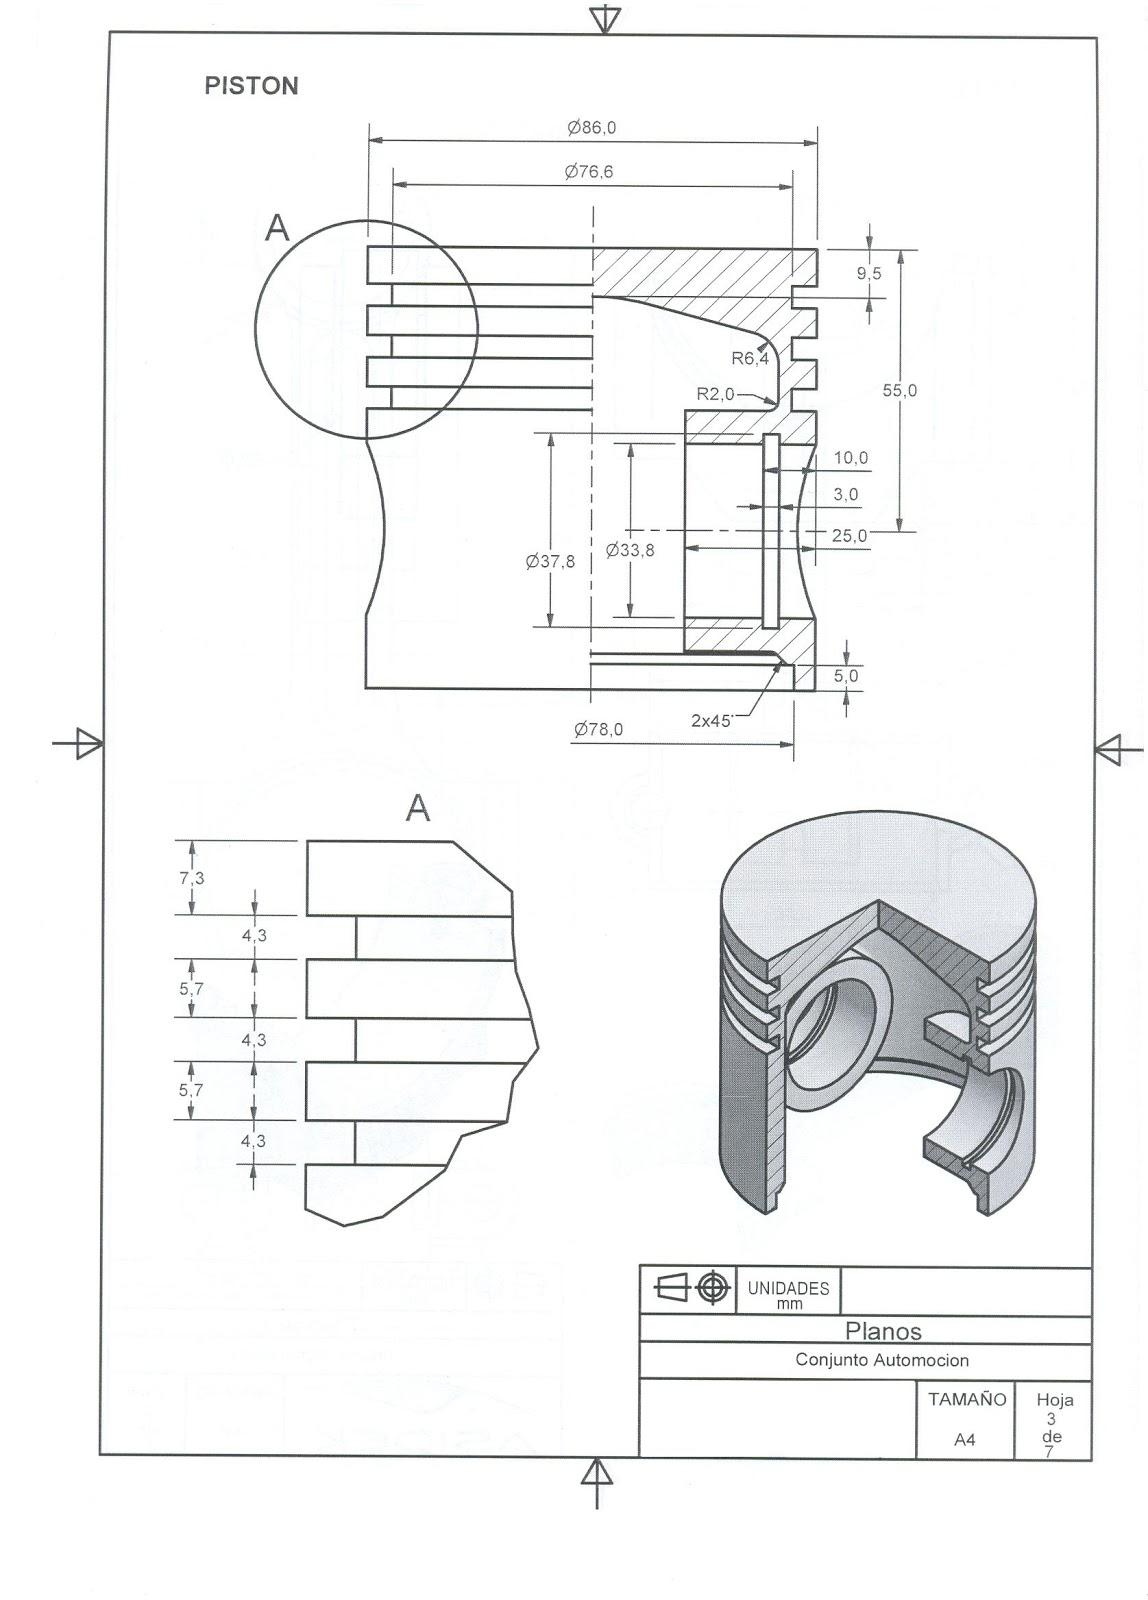 Motor Solidworks Planos